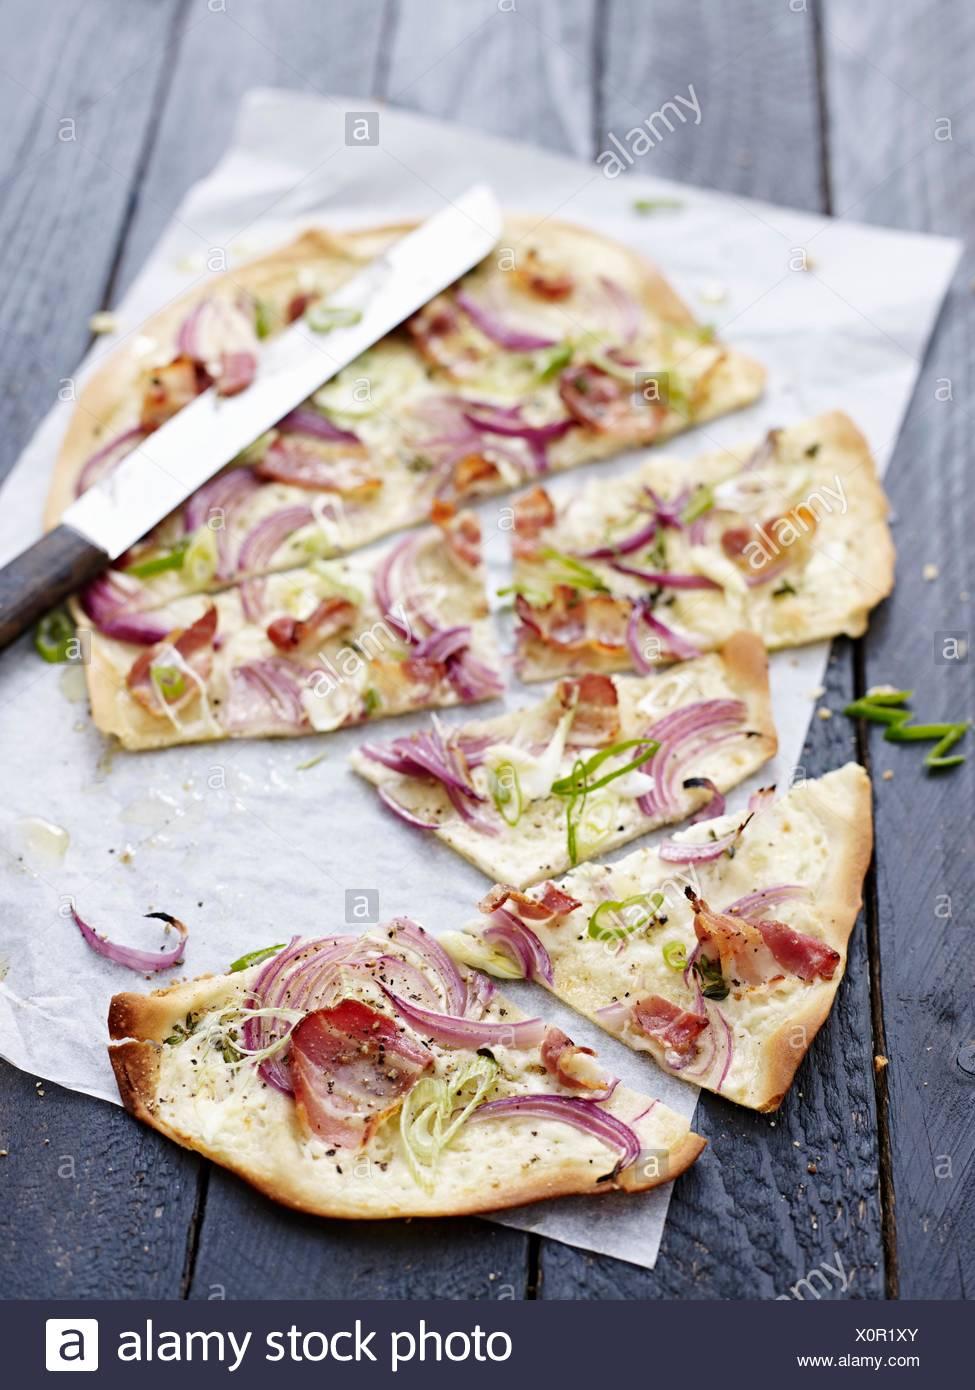 Tarte flambée avec oignons, oignons de printemps et du bacon Photo Stock